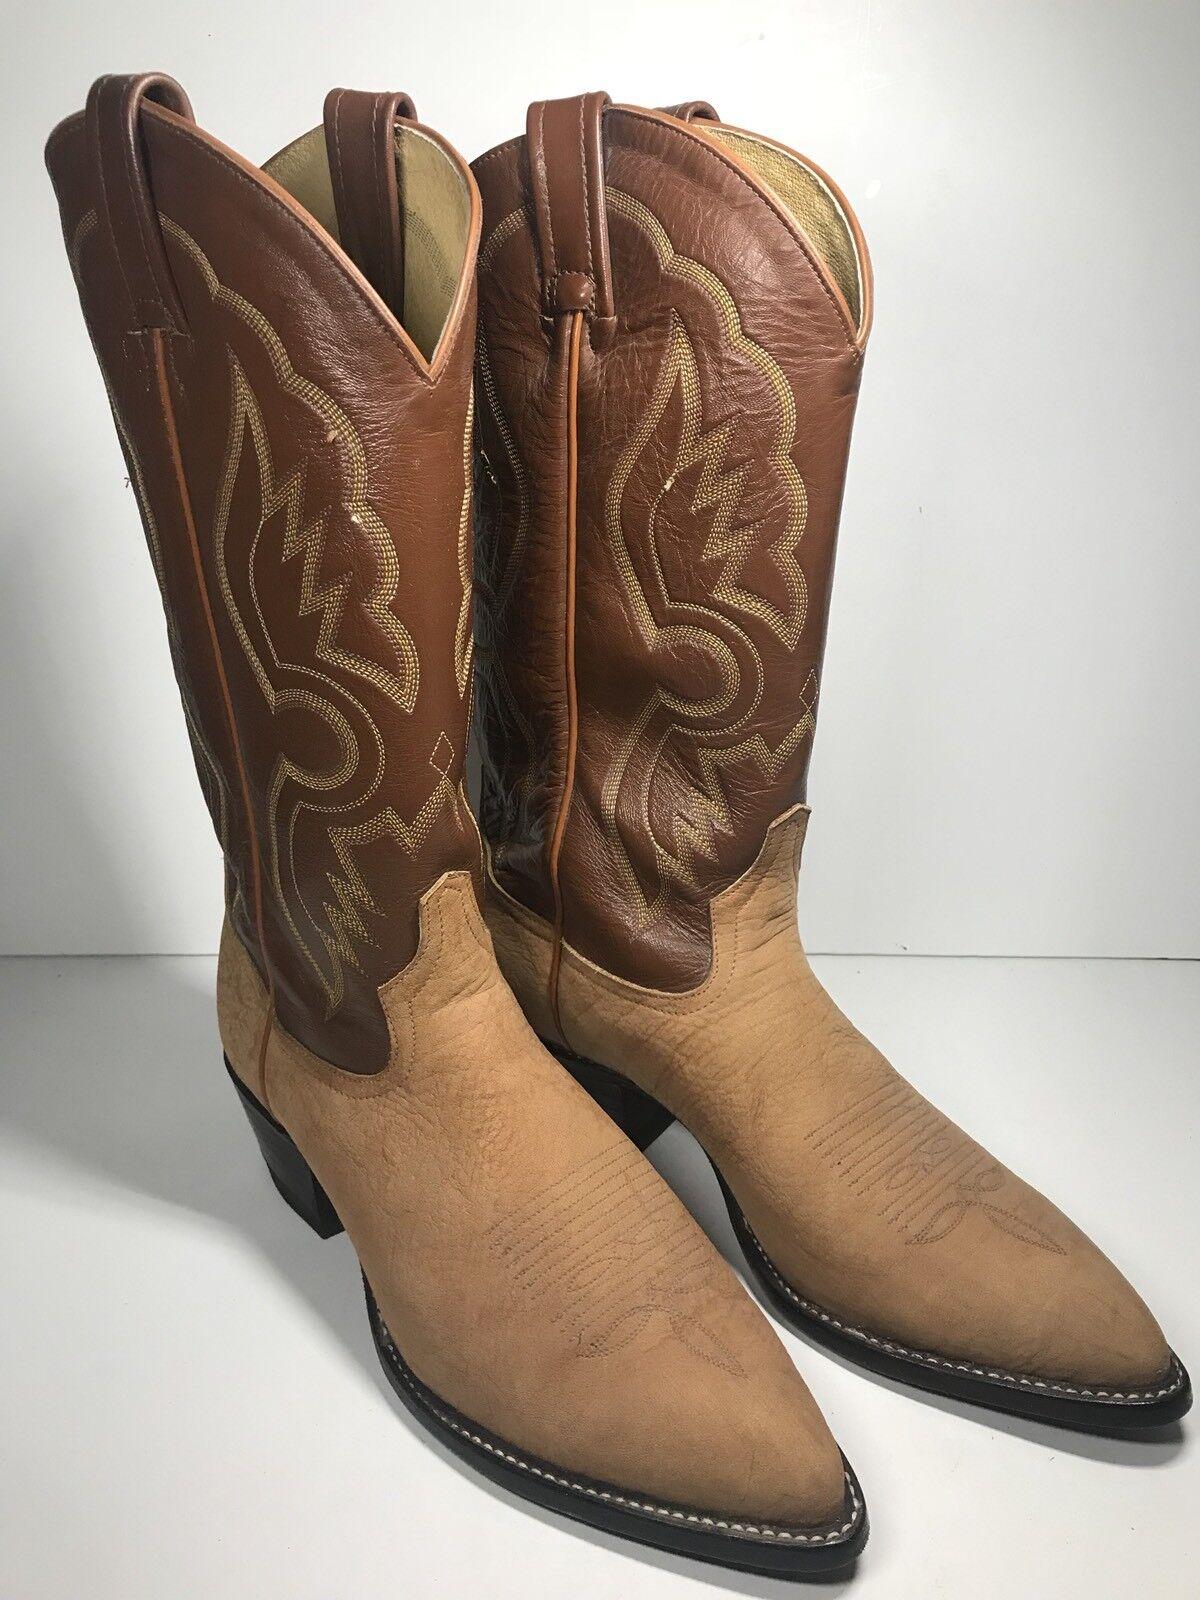 Vintage 1980s TONY LAMA Cowboy Stiefel Stiefel Stiefel Men 9 braun GOAT Leather Western Ranch 6261 2ea4ab